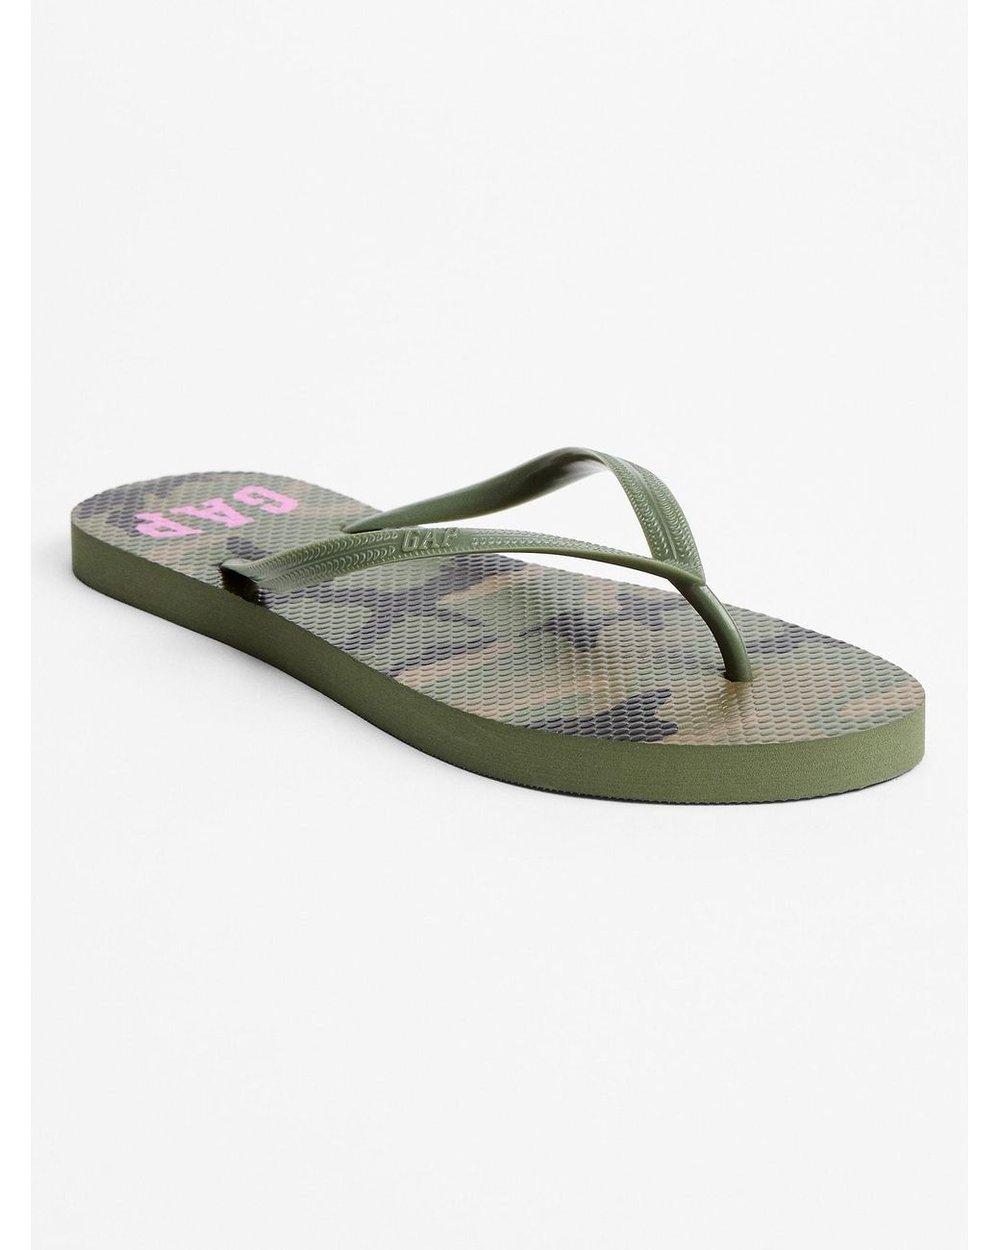 GAP Print Flip Flops- Camo